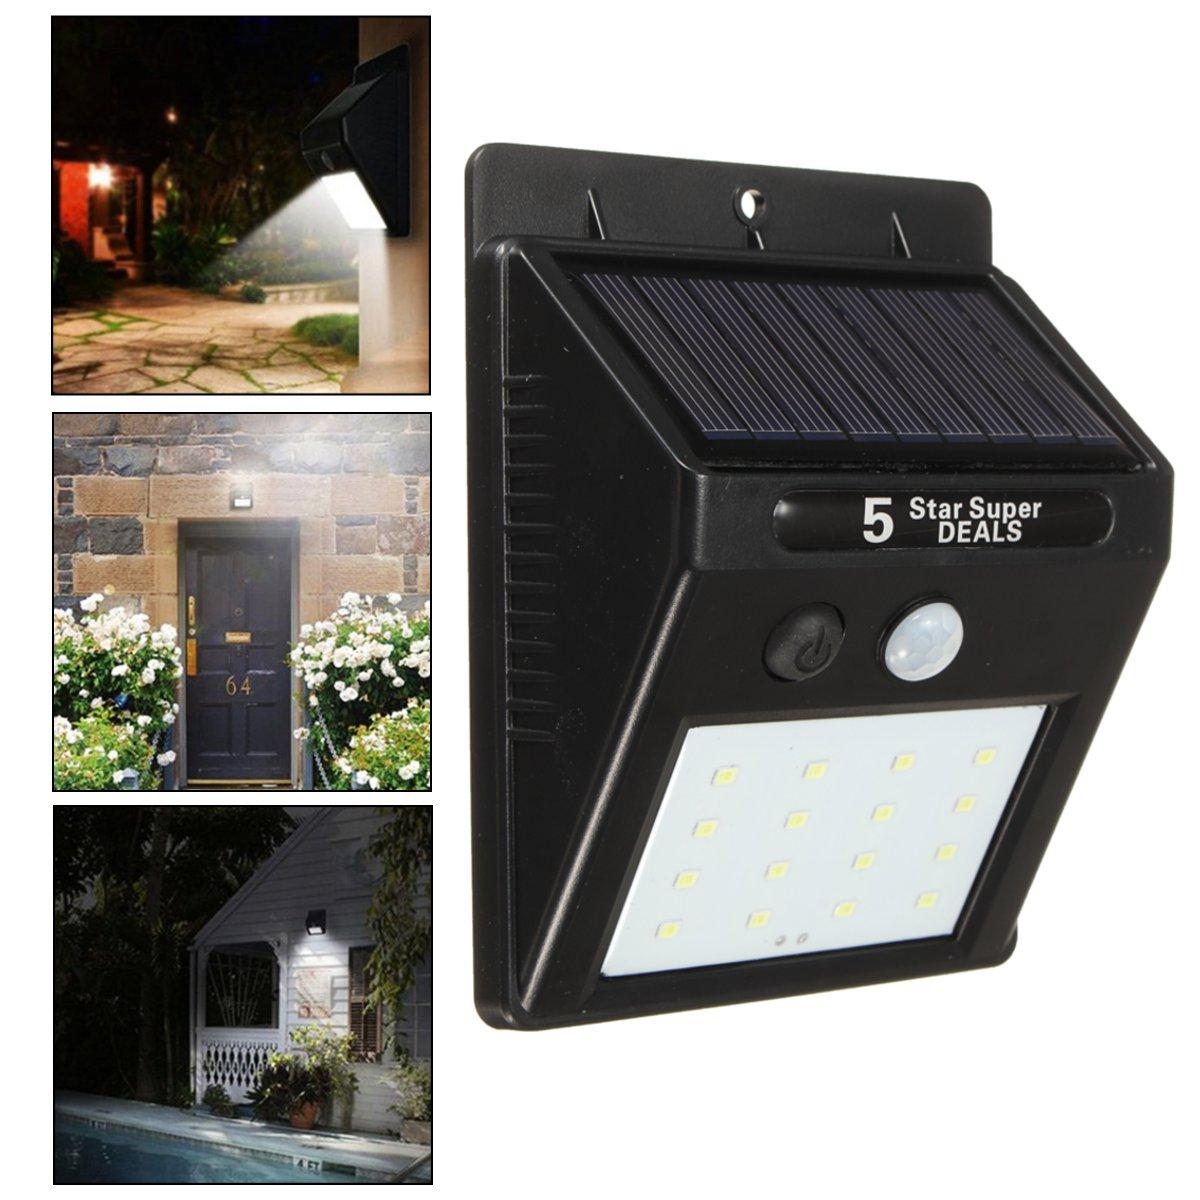 16 LED Solar Power Light Motion Sensor Garden Yard Wall Lamp Waterproof